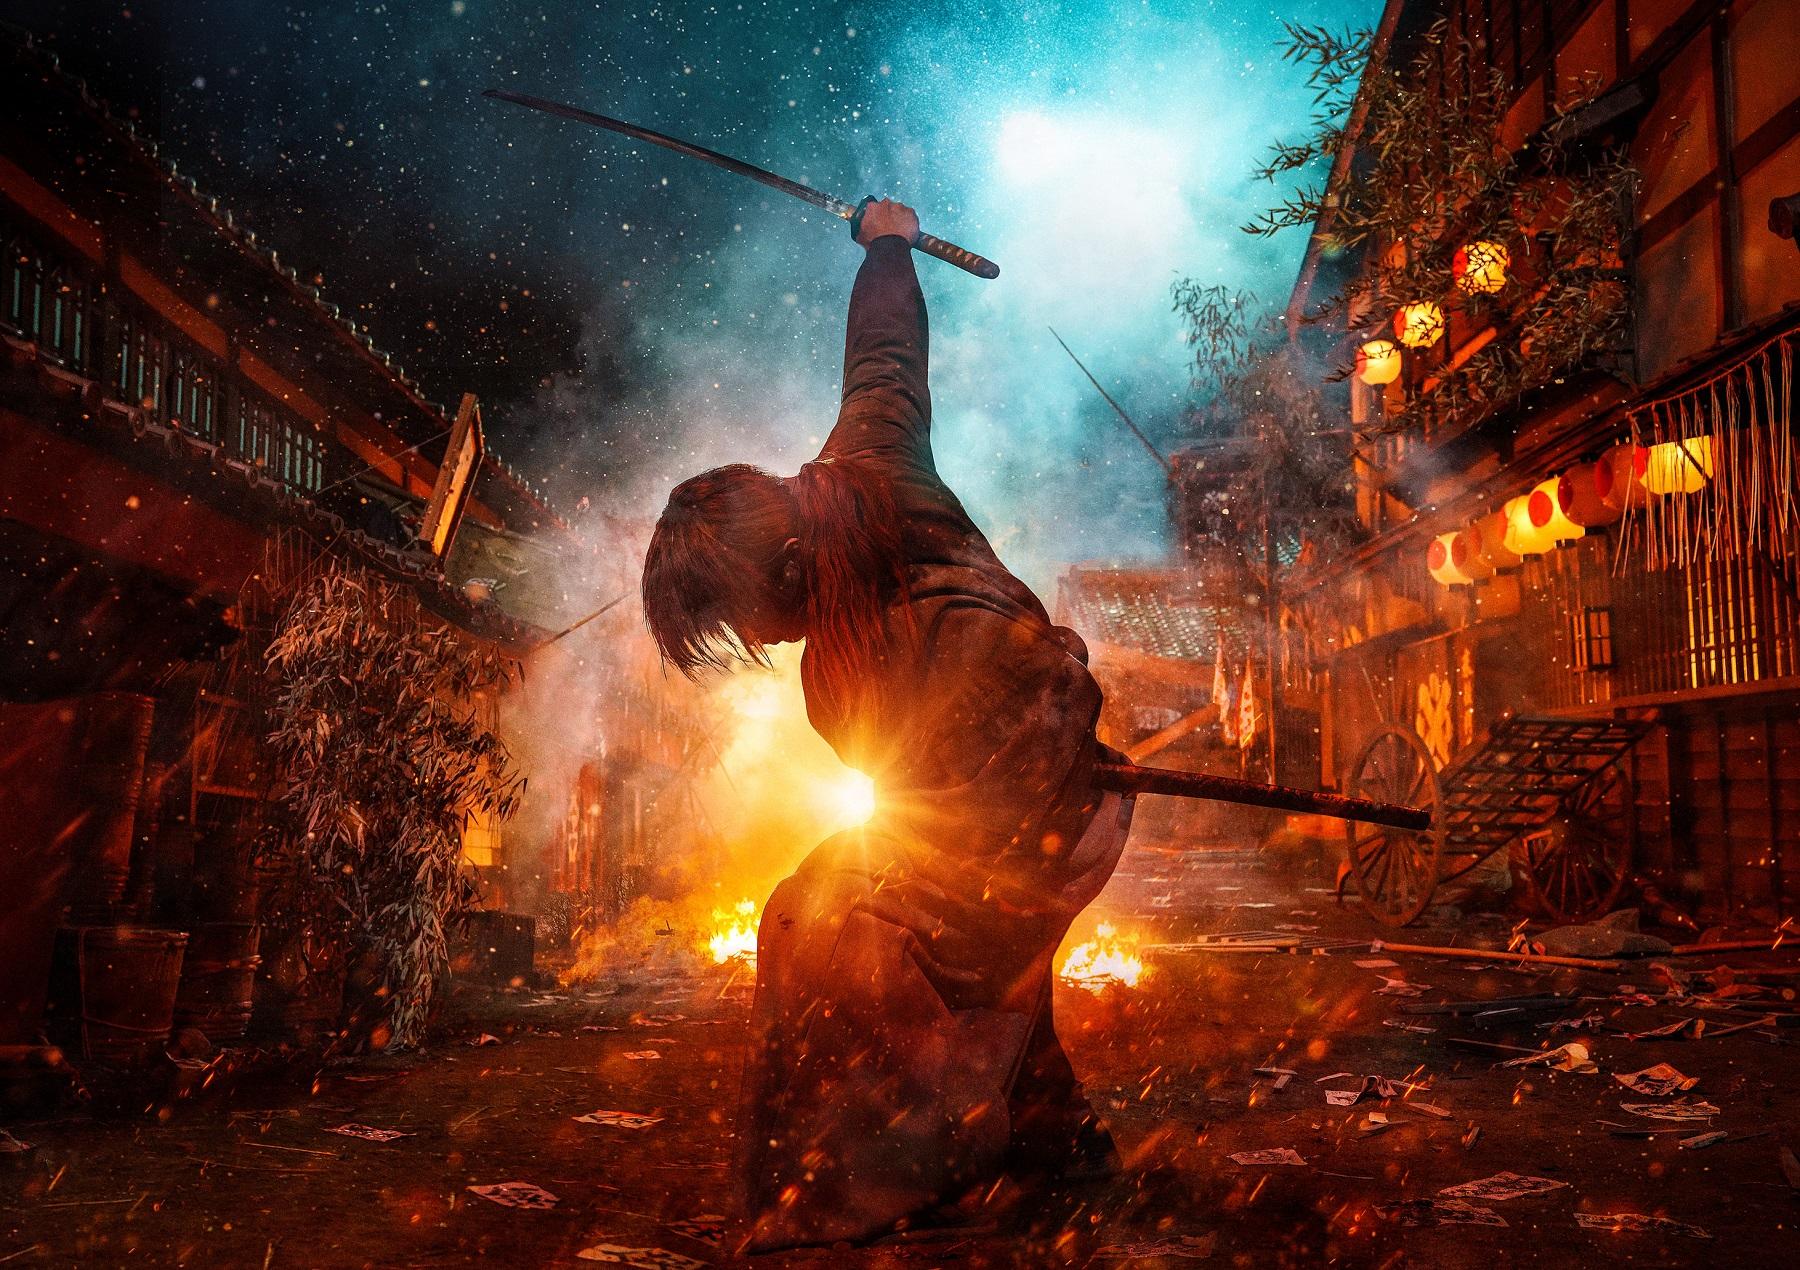 Rurouni Kenshin_るろうに剣心_浪客剑心